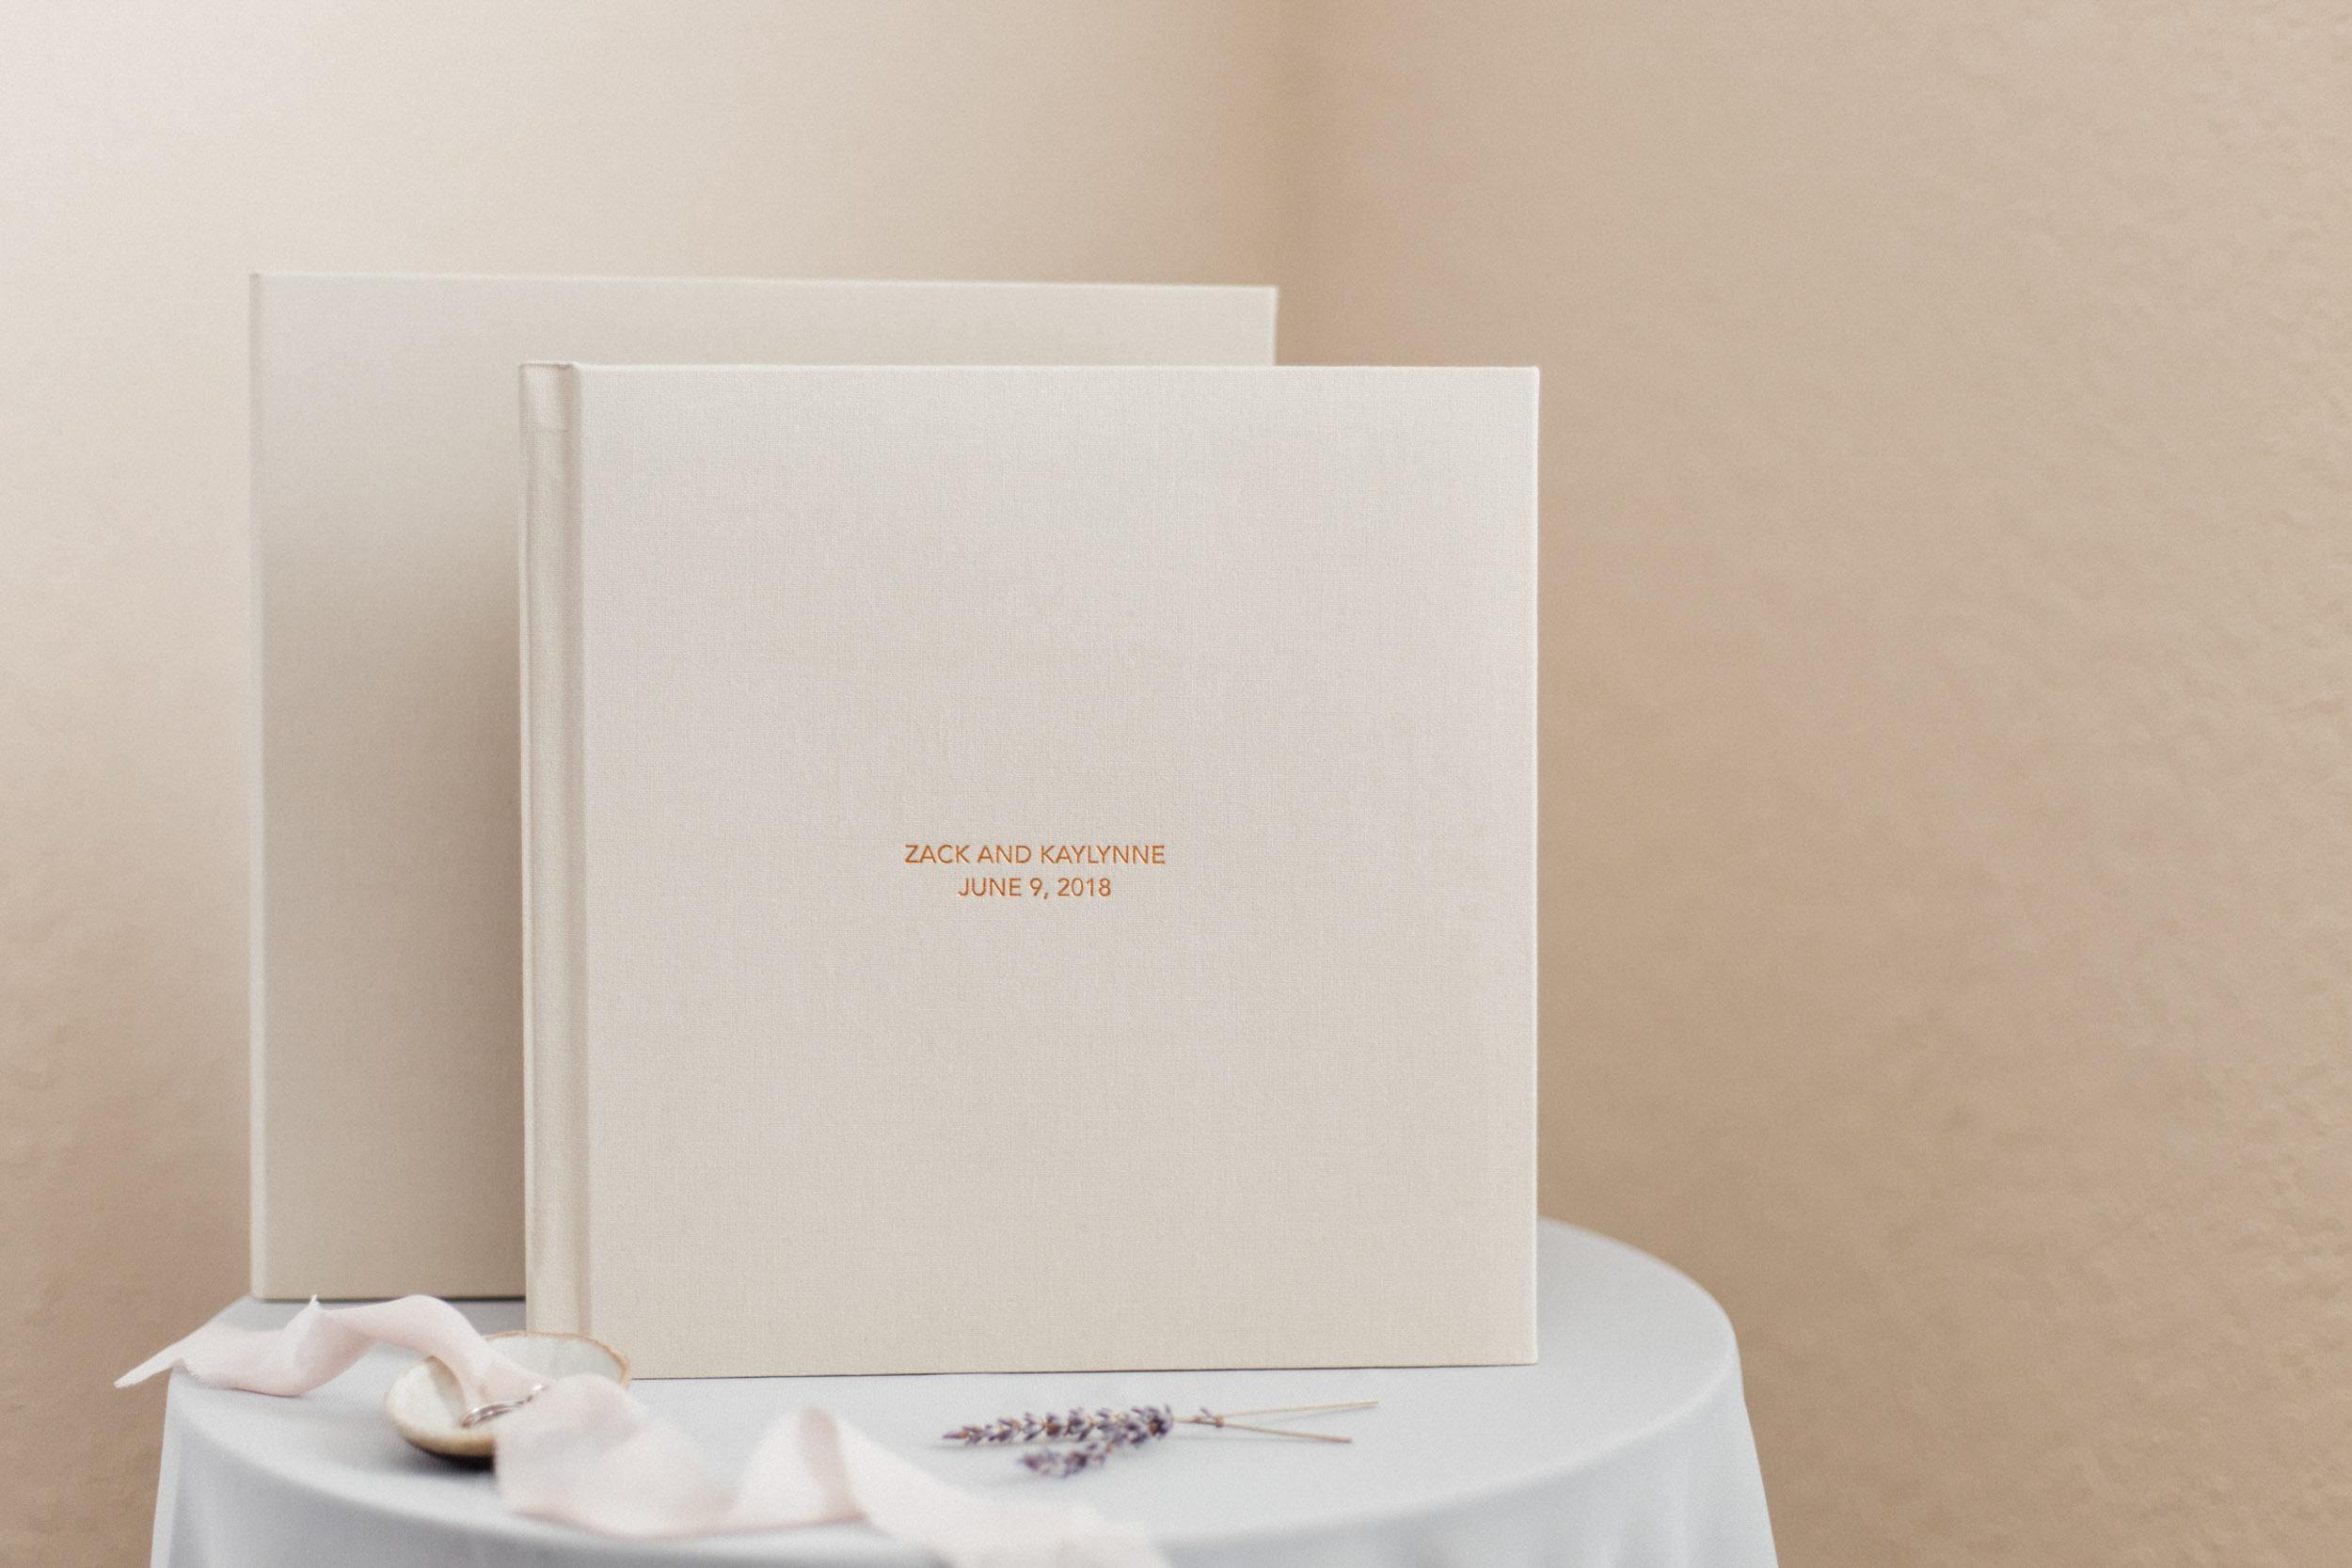 Carography-Studios-St-Augustine-Wedding-Photos-amber-concept-carography-studios-I58A9585.jpg